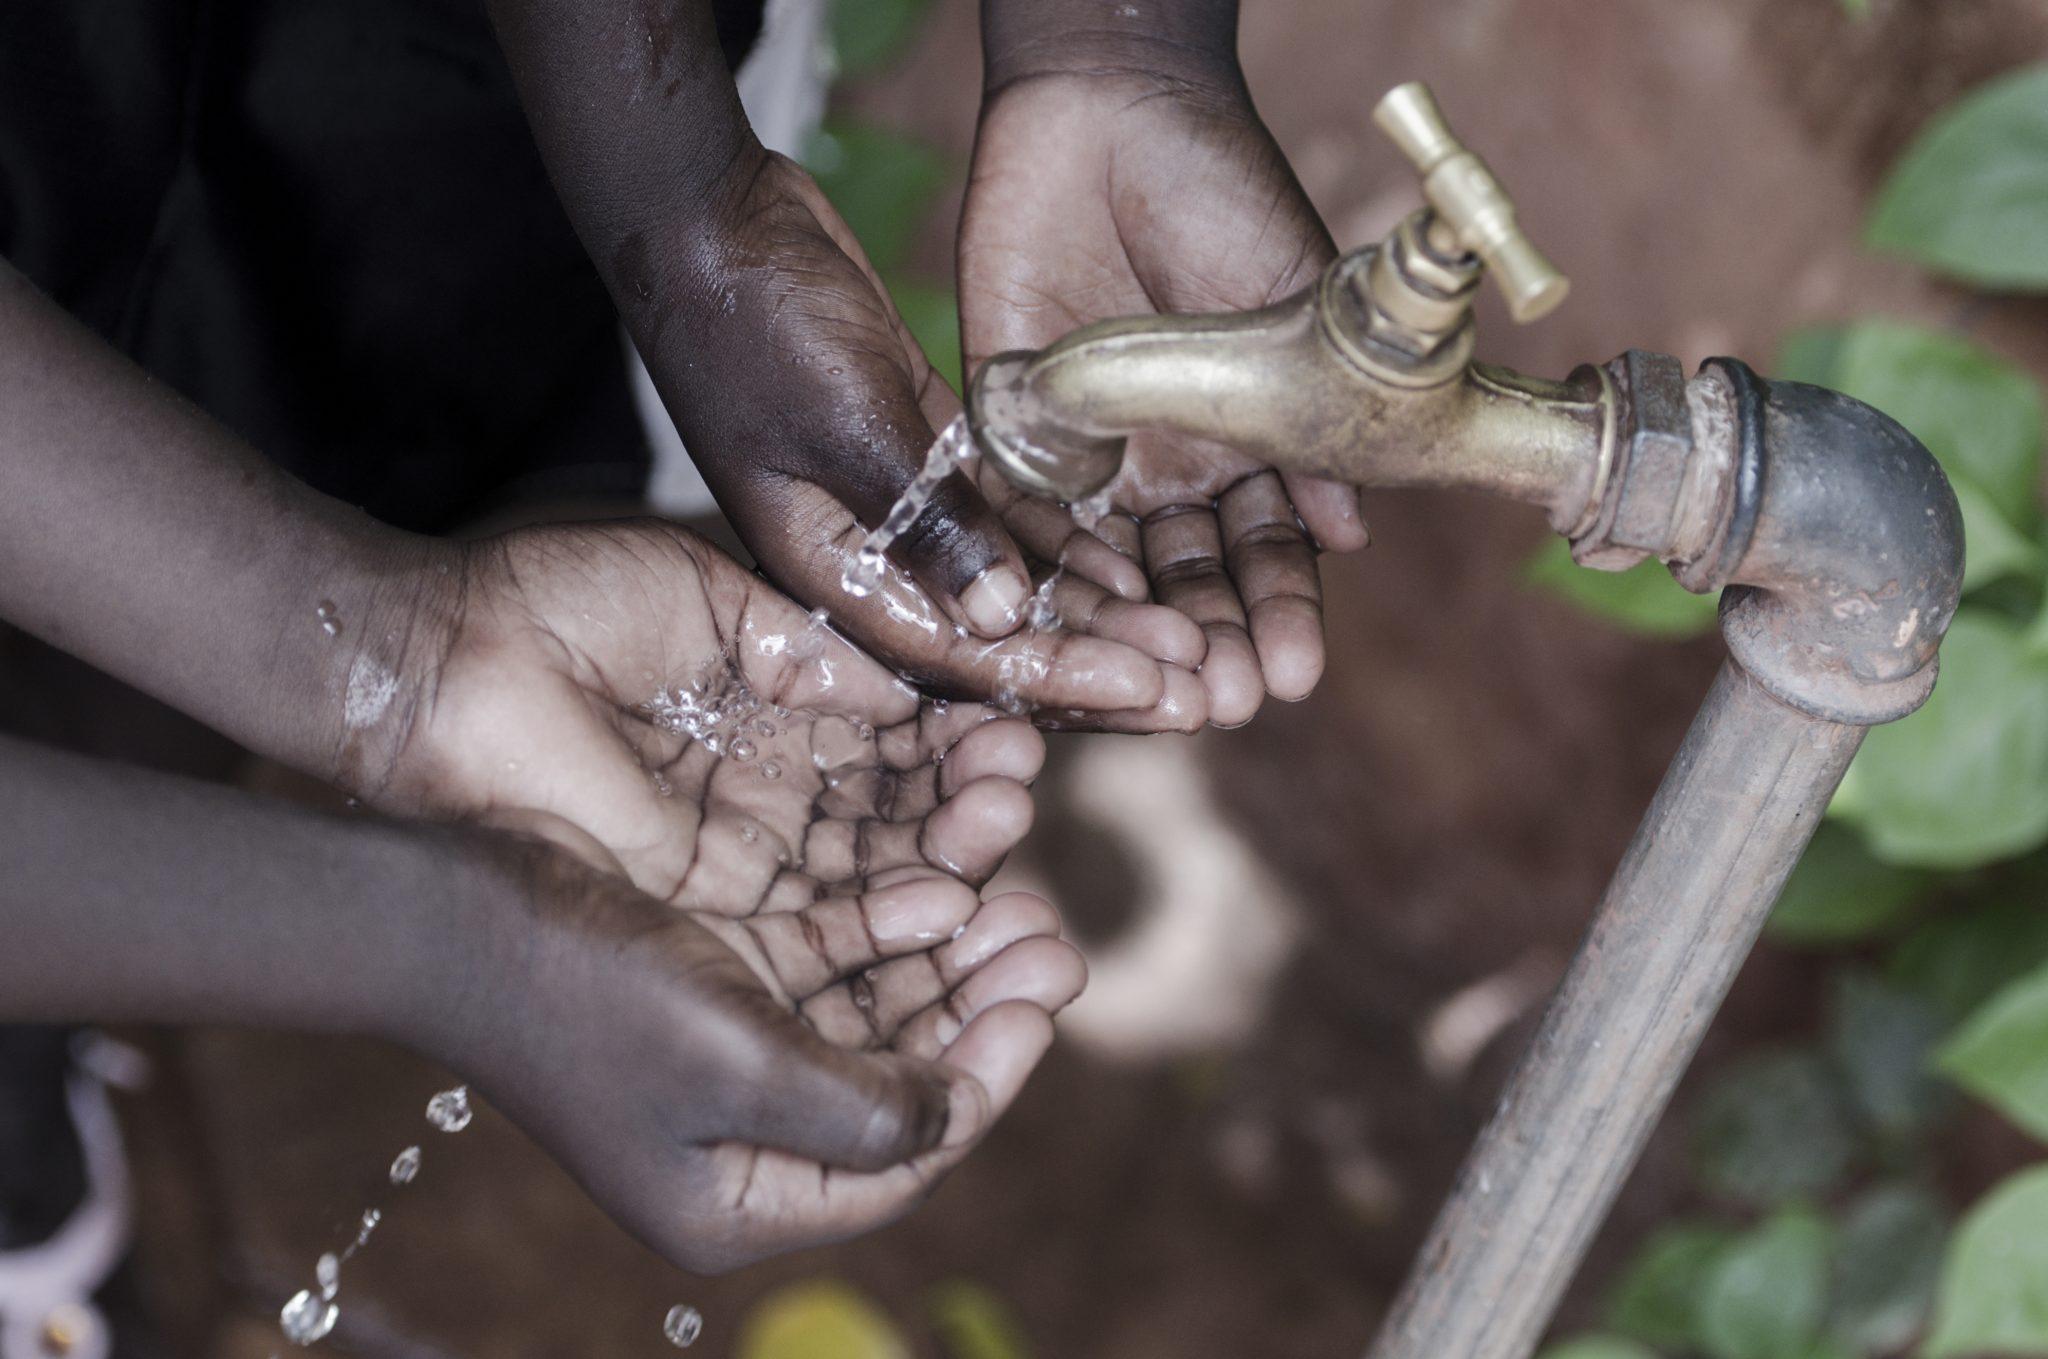 Hands of african children under tap